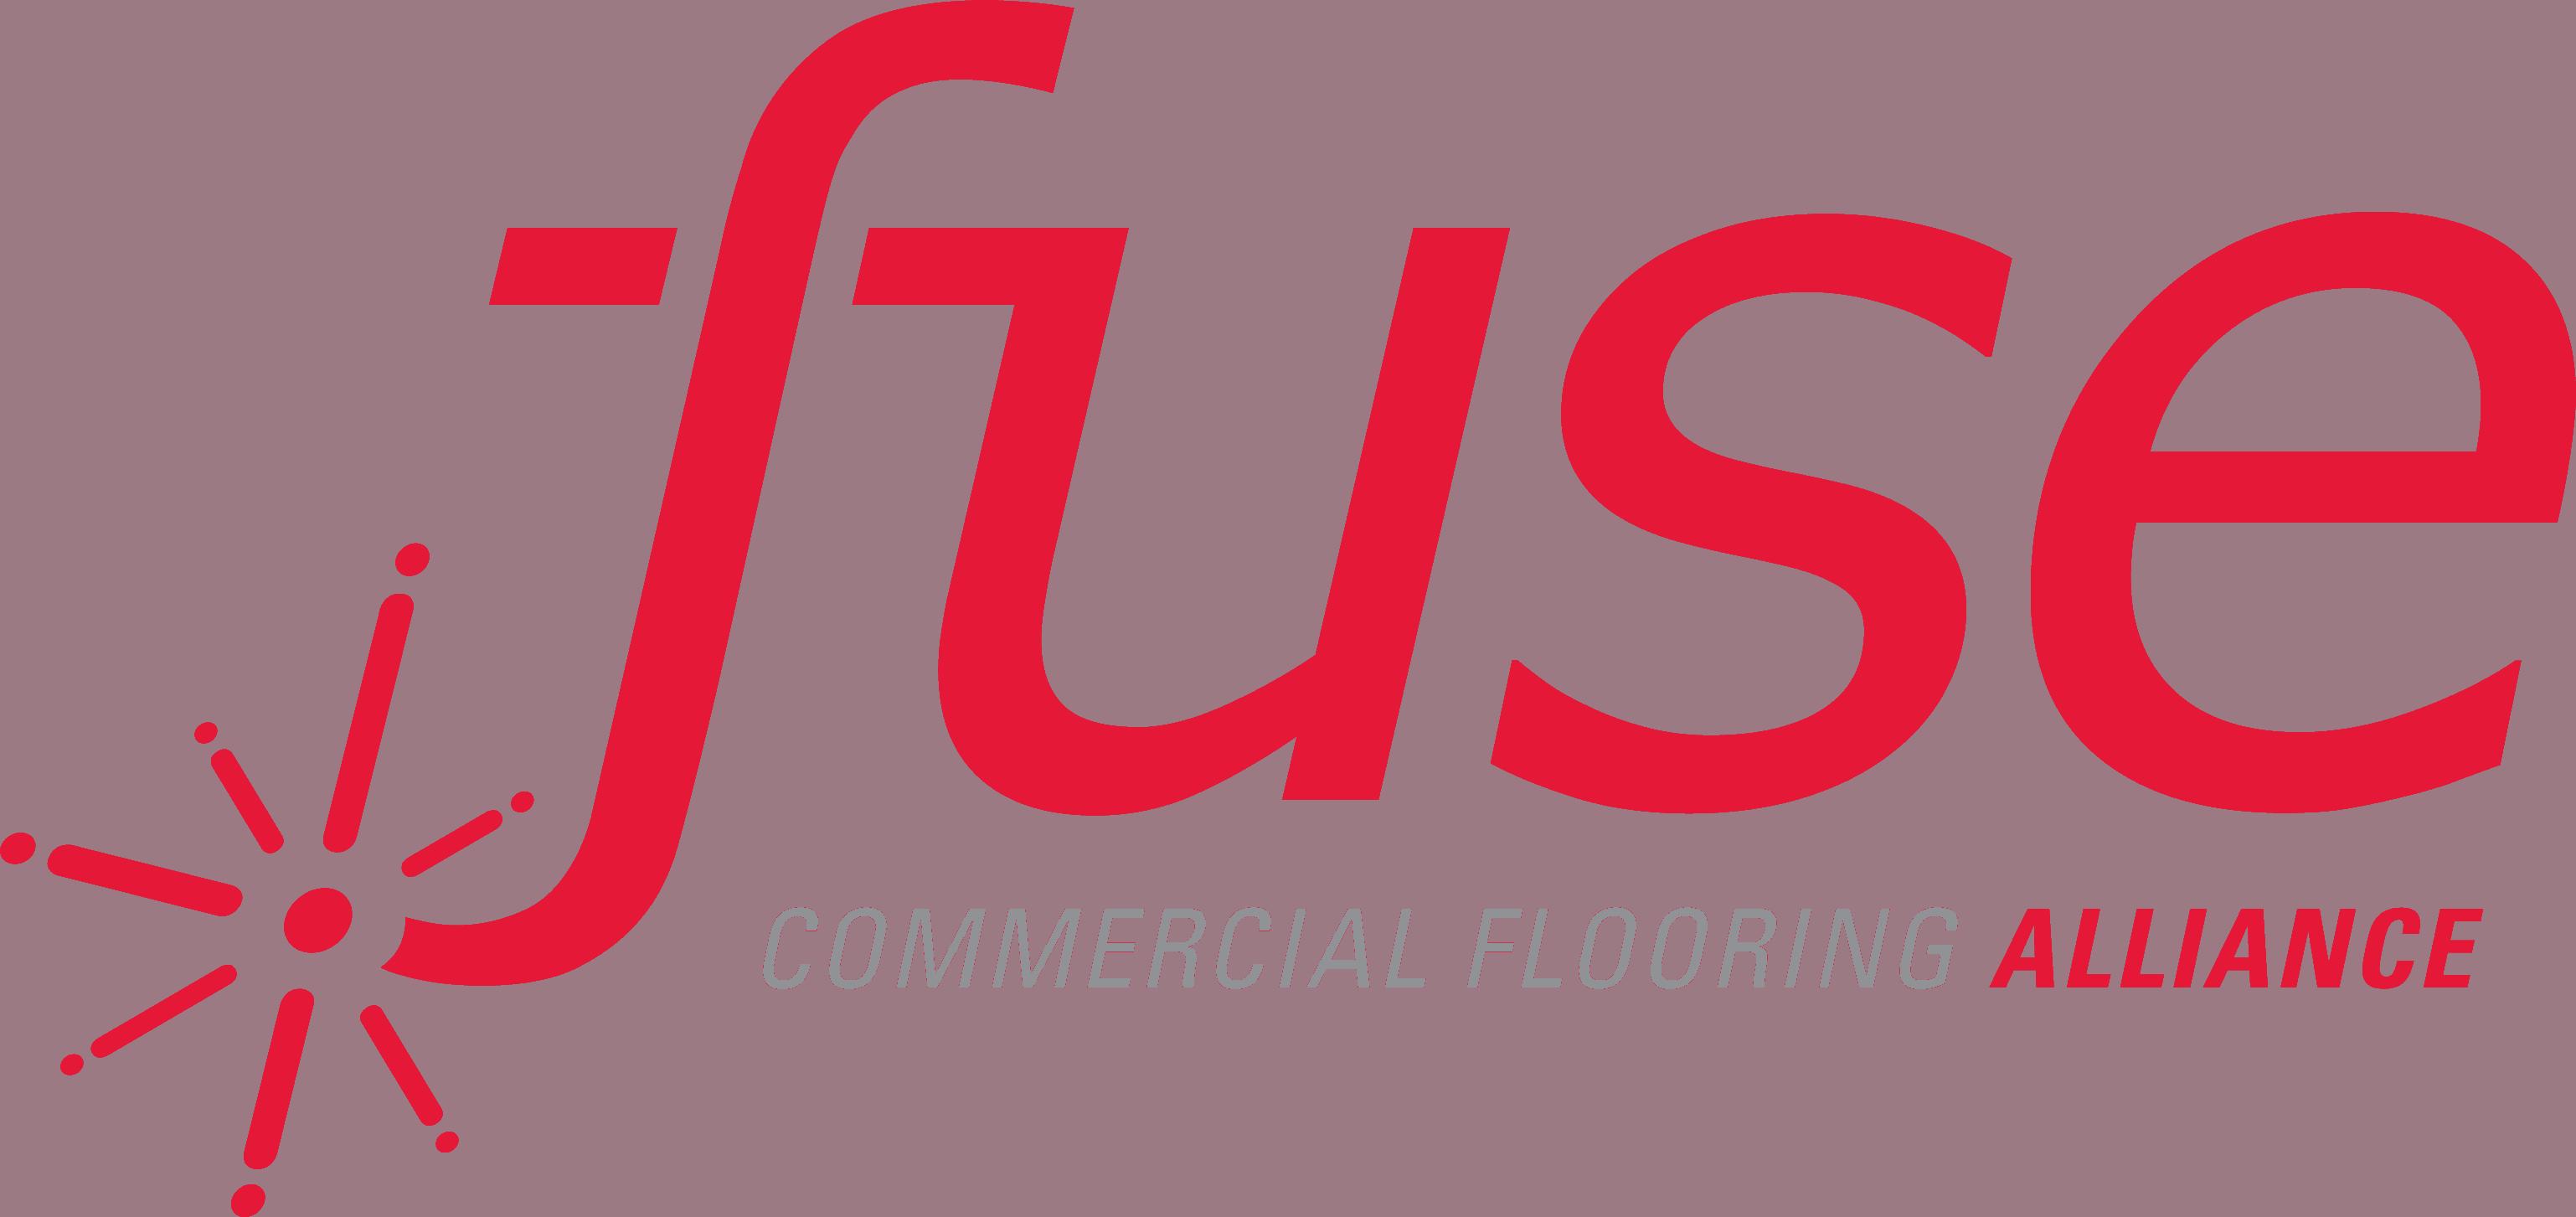 https://cfiinstallers.org/wp-content/uploads/2019/04/FUSE_logo_PMS_2Color-186C.png